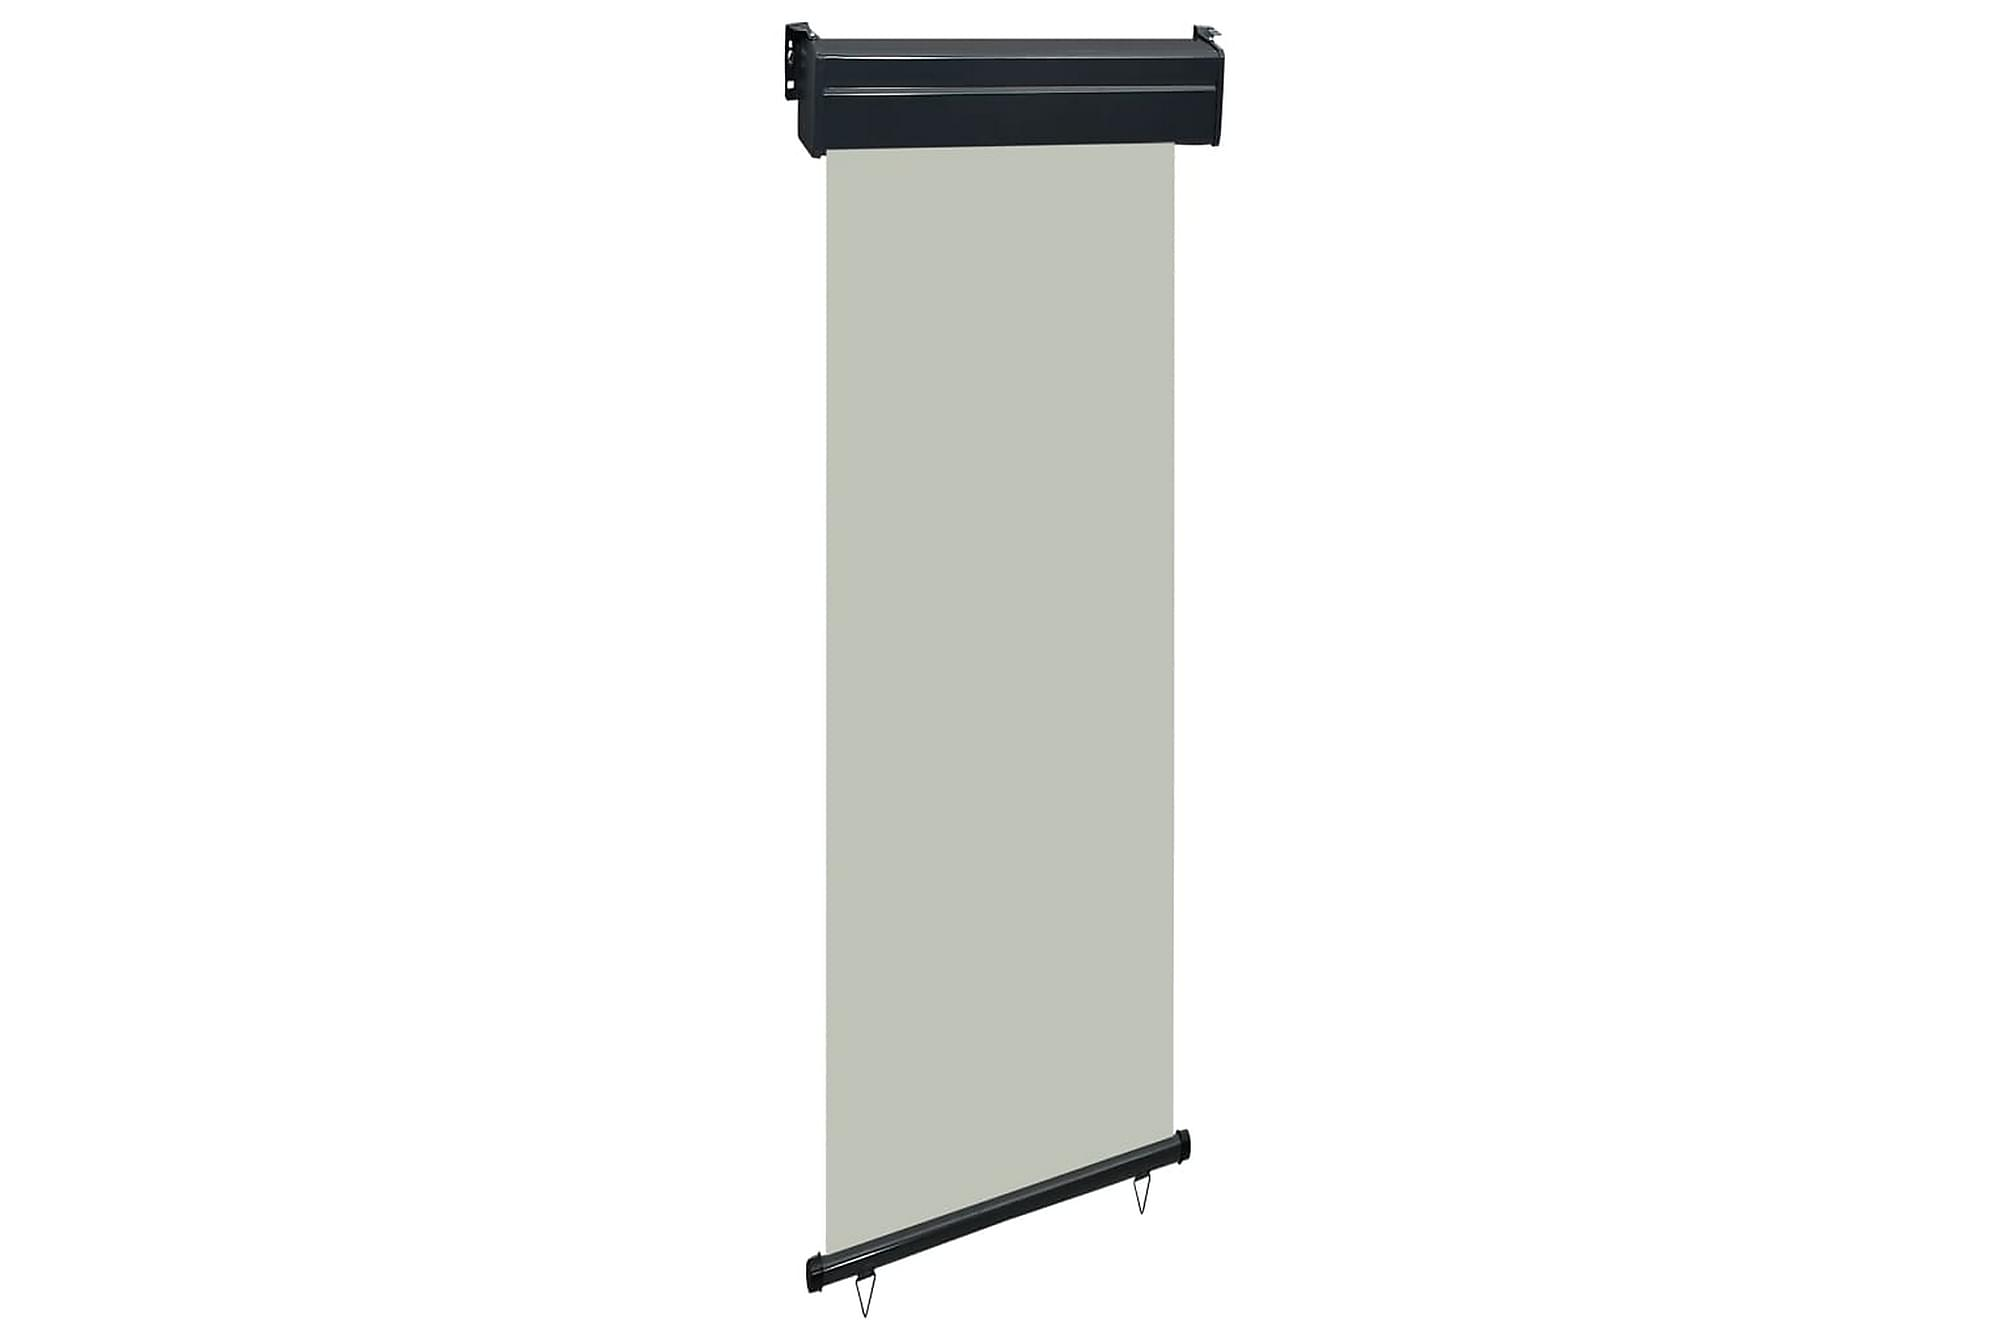 Balkongmarkis 60x250 cm grå, Markiser